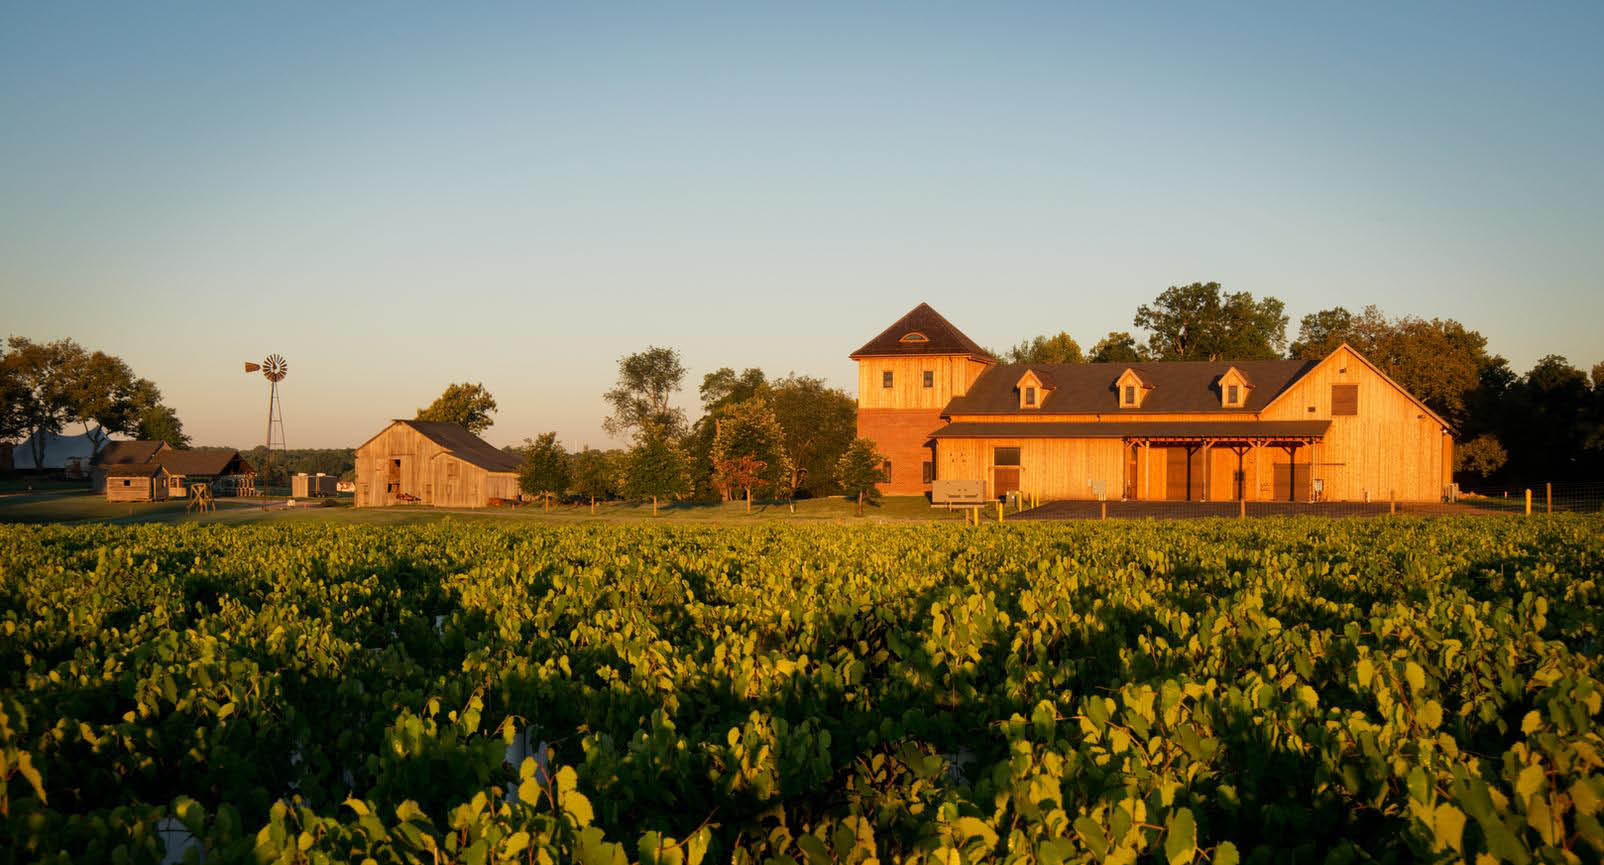 Chateau Bu De Winery, winery, wine, wine valpak, wine discount, winery tour, events, wedding, wine tasting, tasting room, wine coupon, vineyard, live music